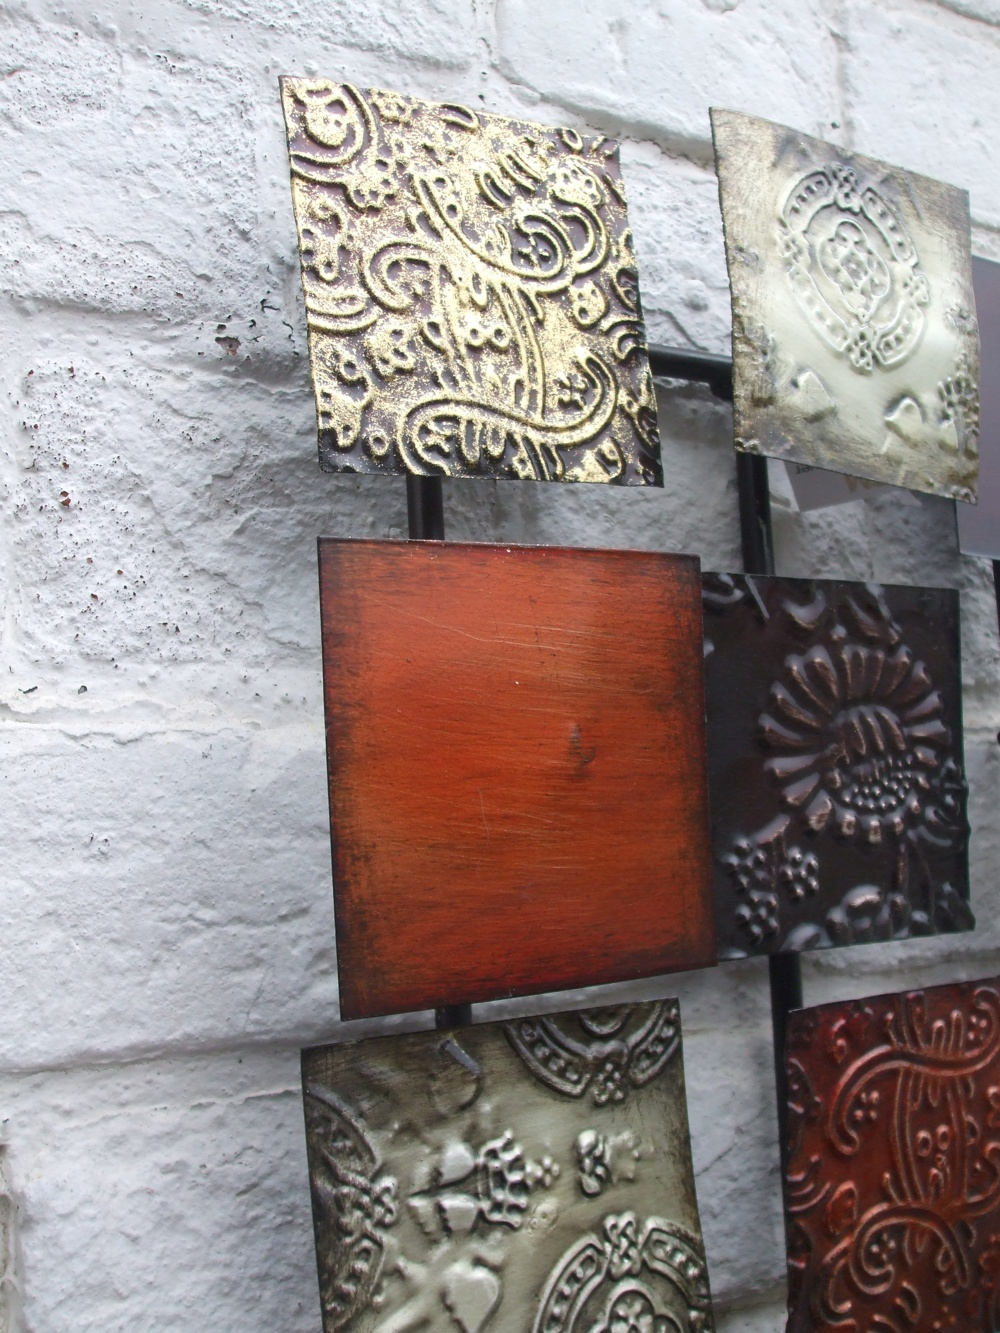 Kunstobjekt wanddekoration dekoratives wandobjekt metall impressionen ebay - Wanddekoration metall ...